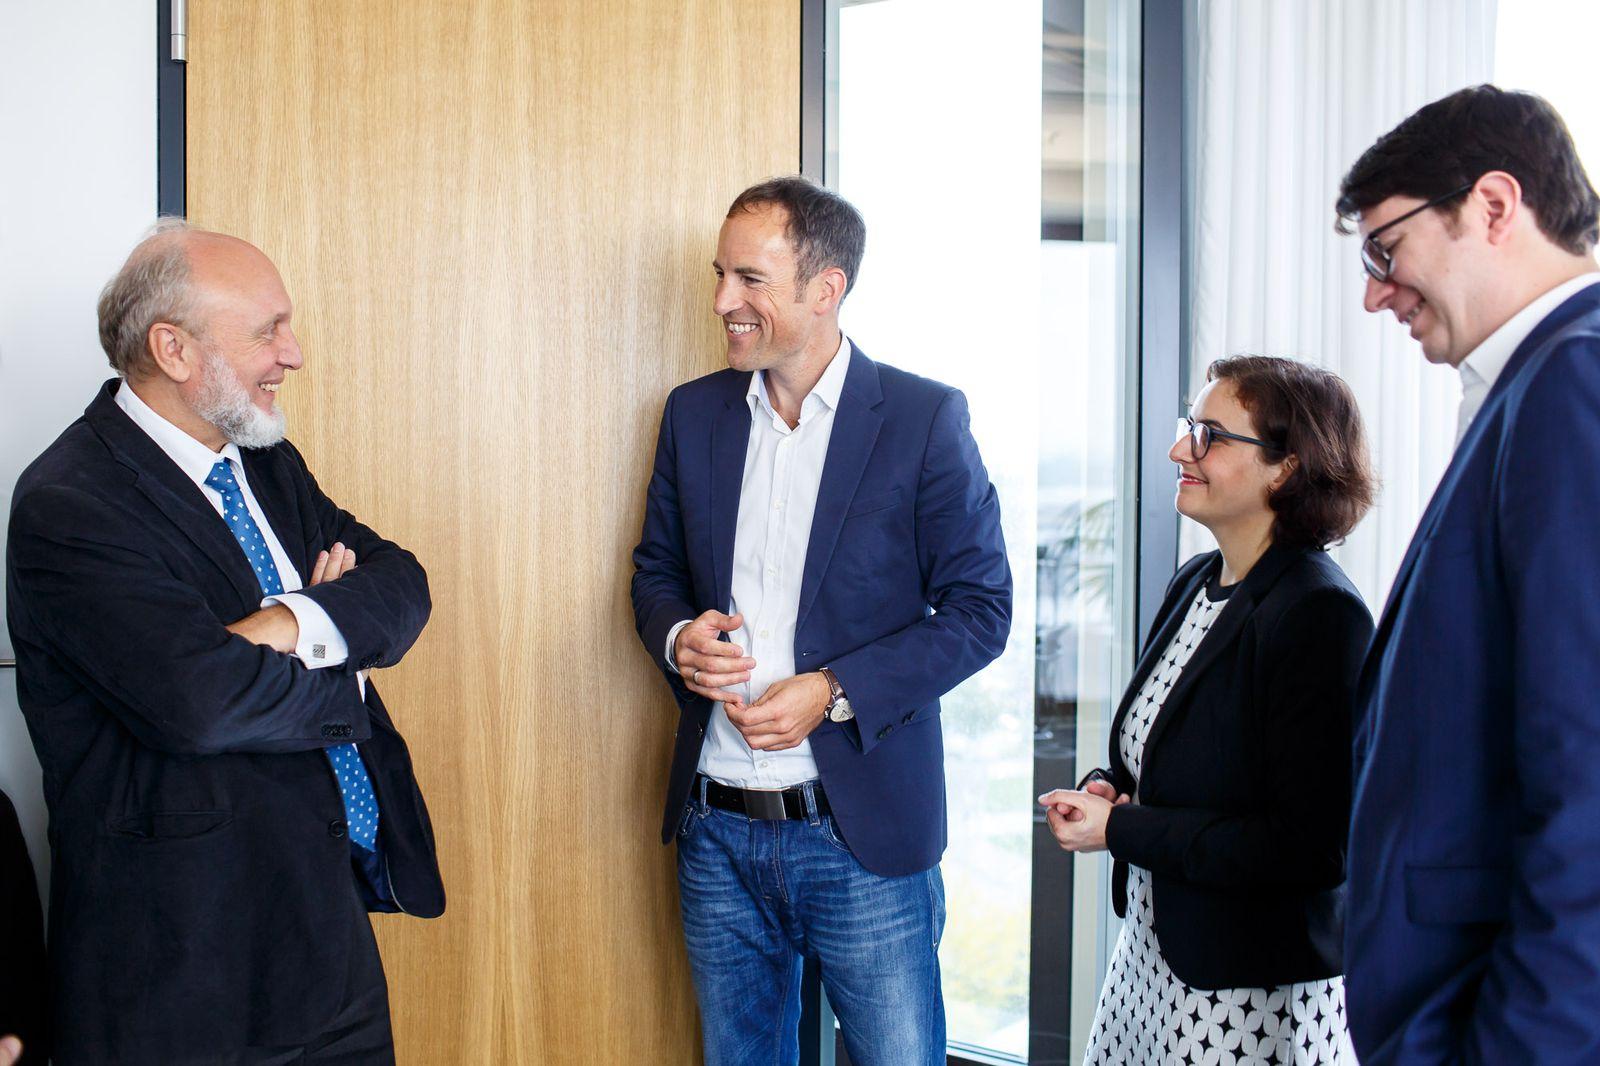 Hans-Werner Sinn/ Florian Harms/ Yasmin El-Sharif/ Stefan Kaiser